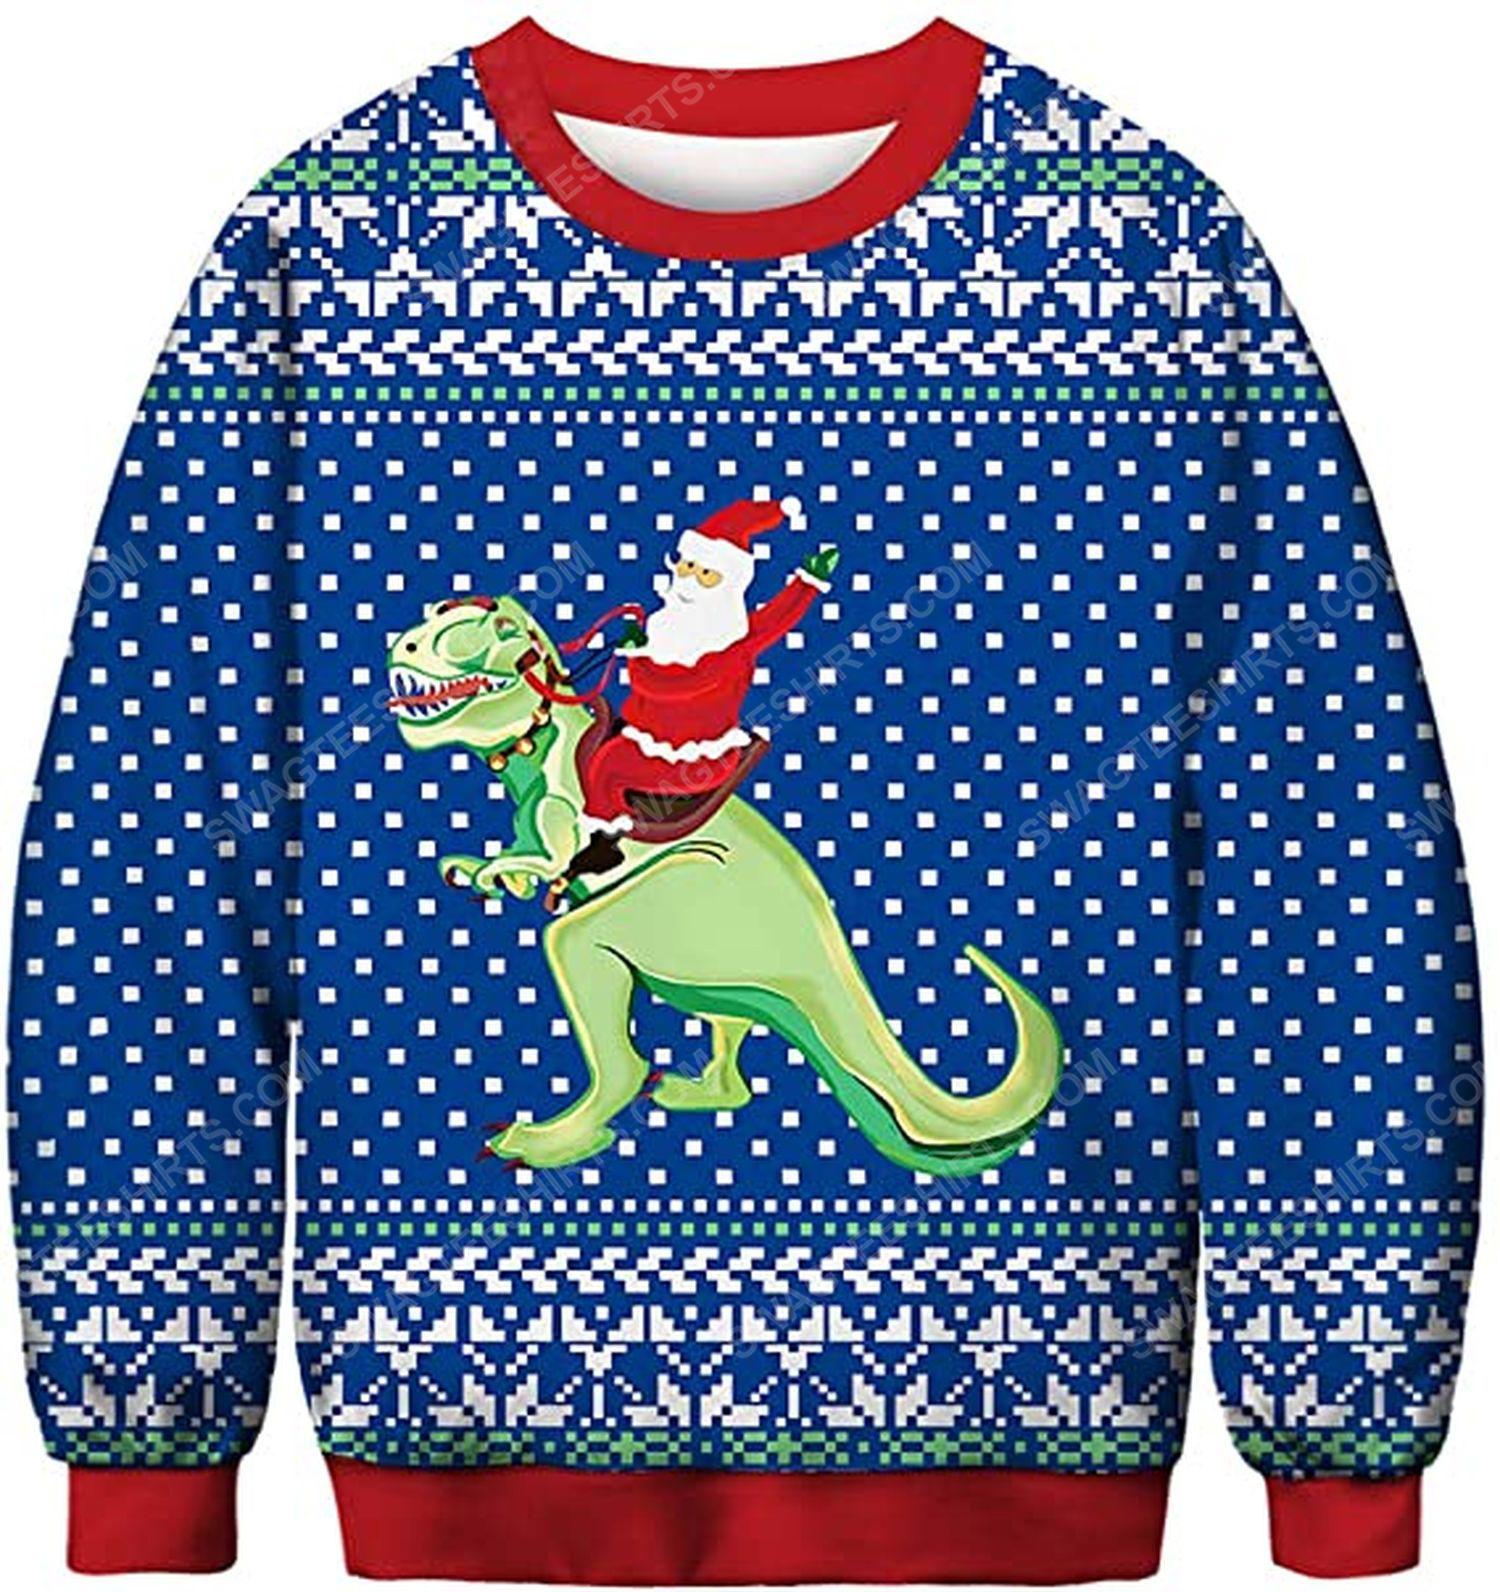 Santa claus riding a dinosaur full print ugly christmas sweater 2 - Copy (3)